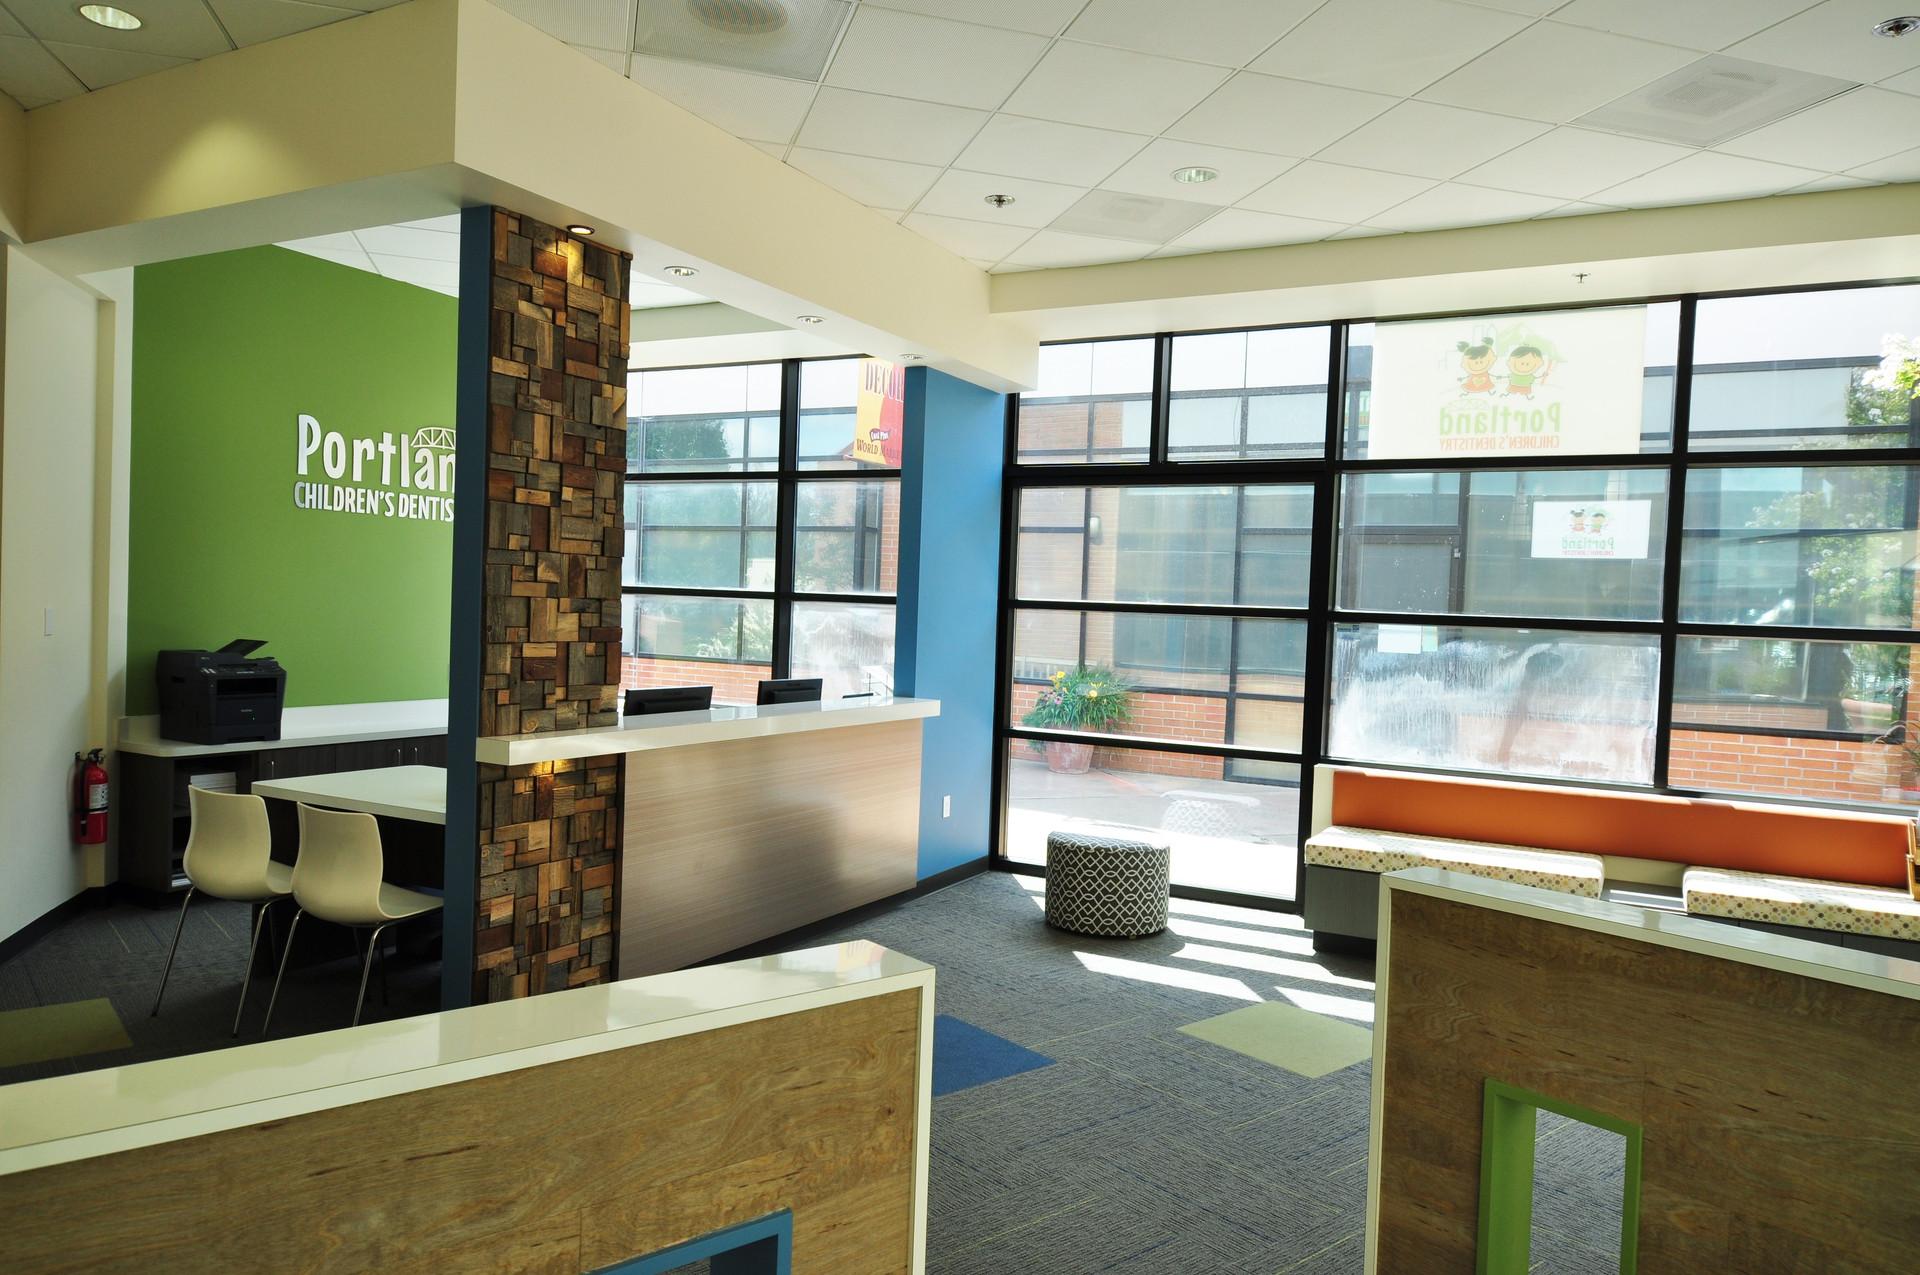 Portland Children's Dentistry